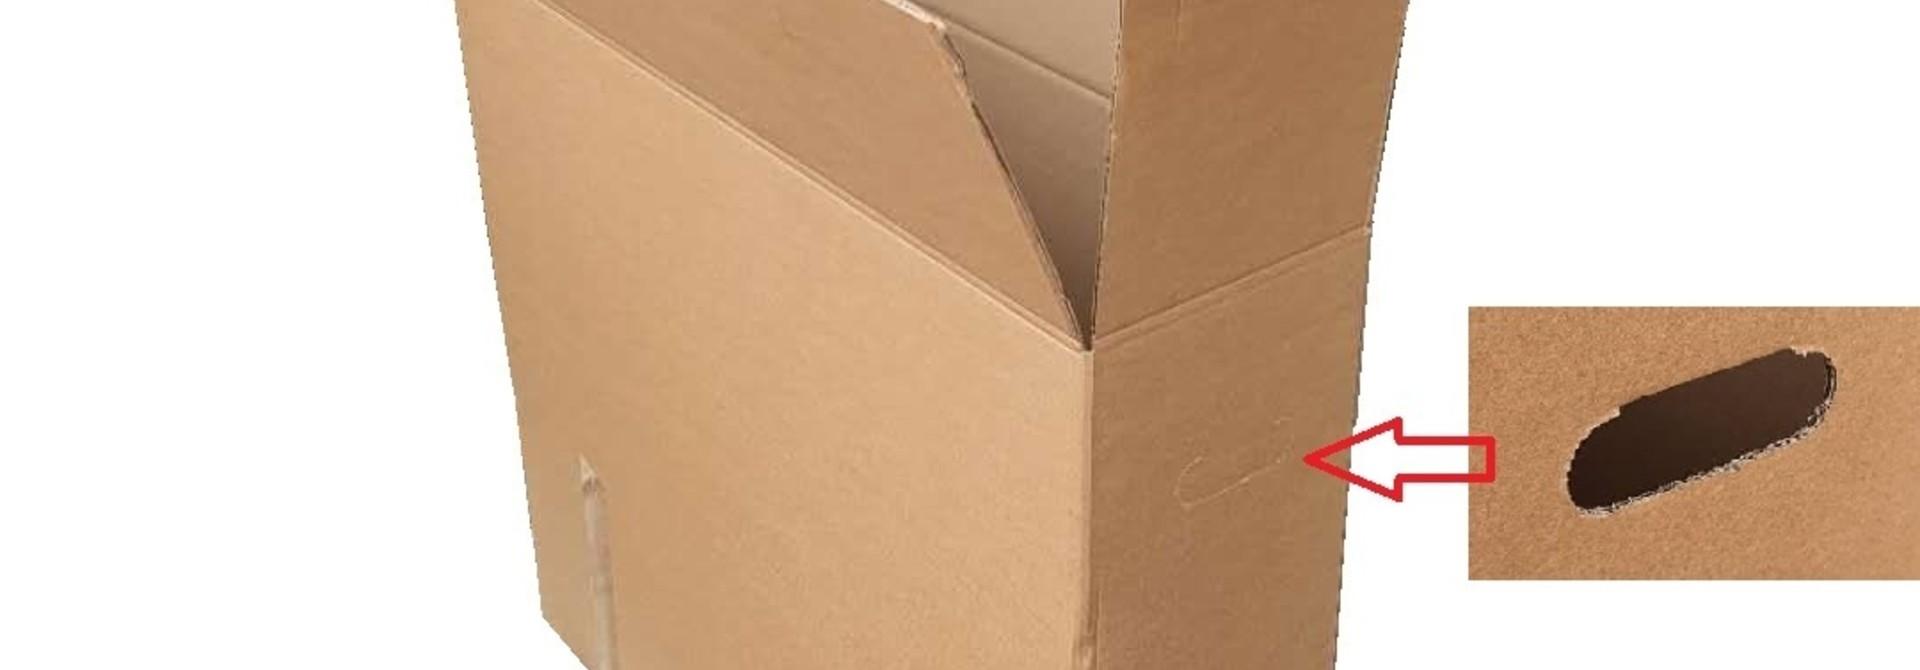 box carton 80-10-65 dop 4.5